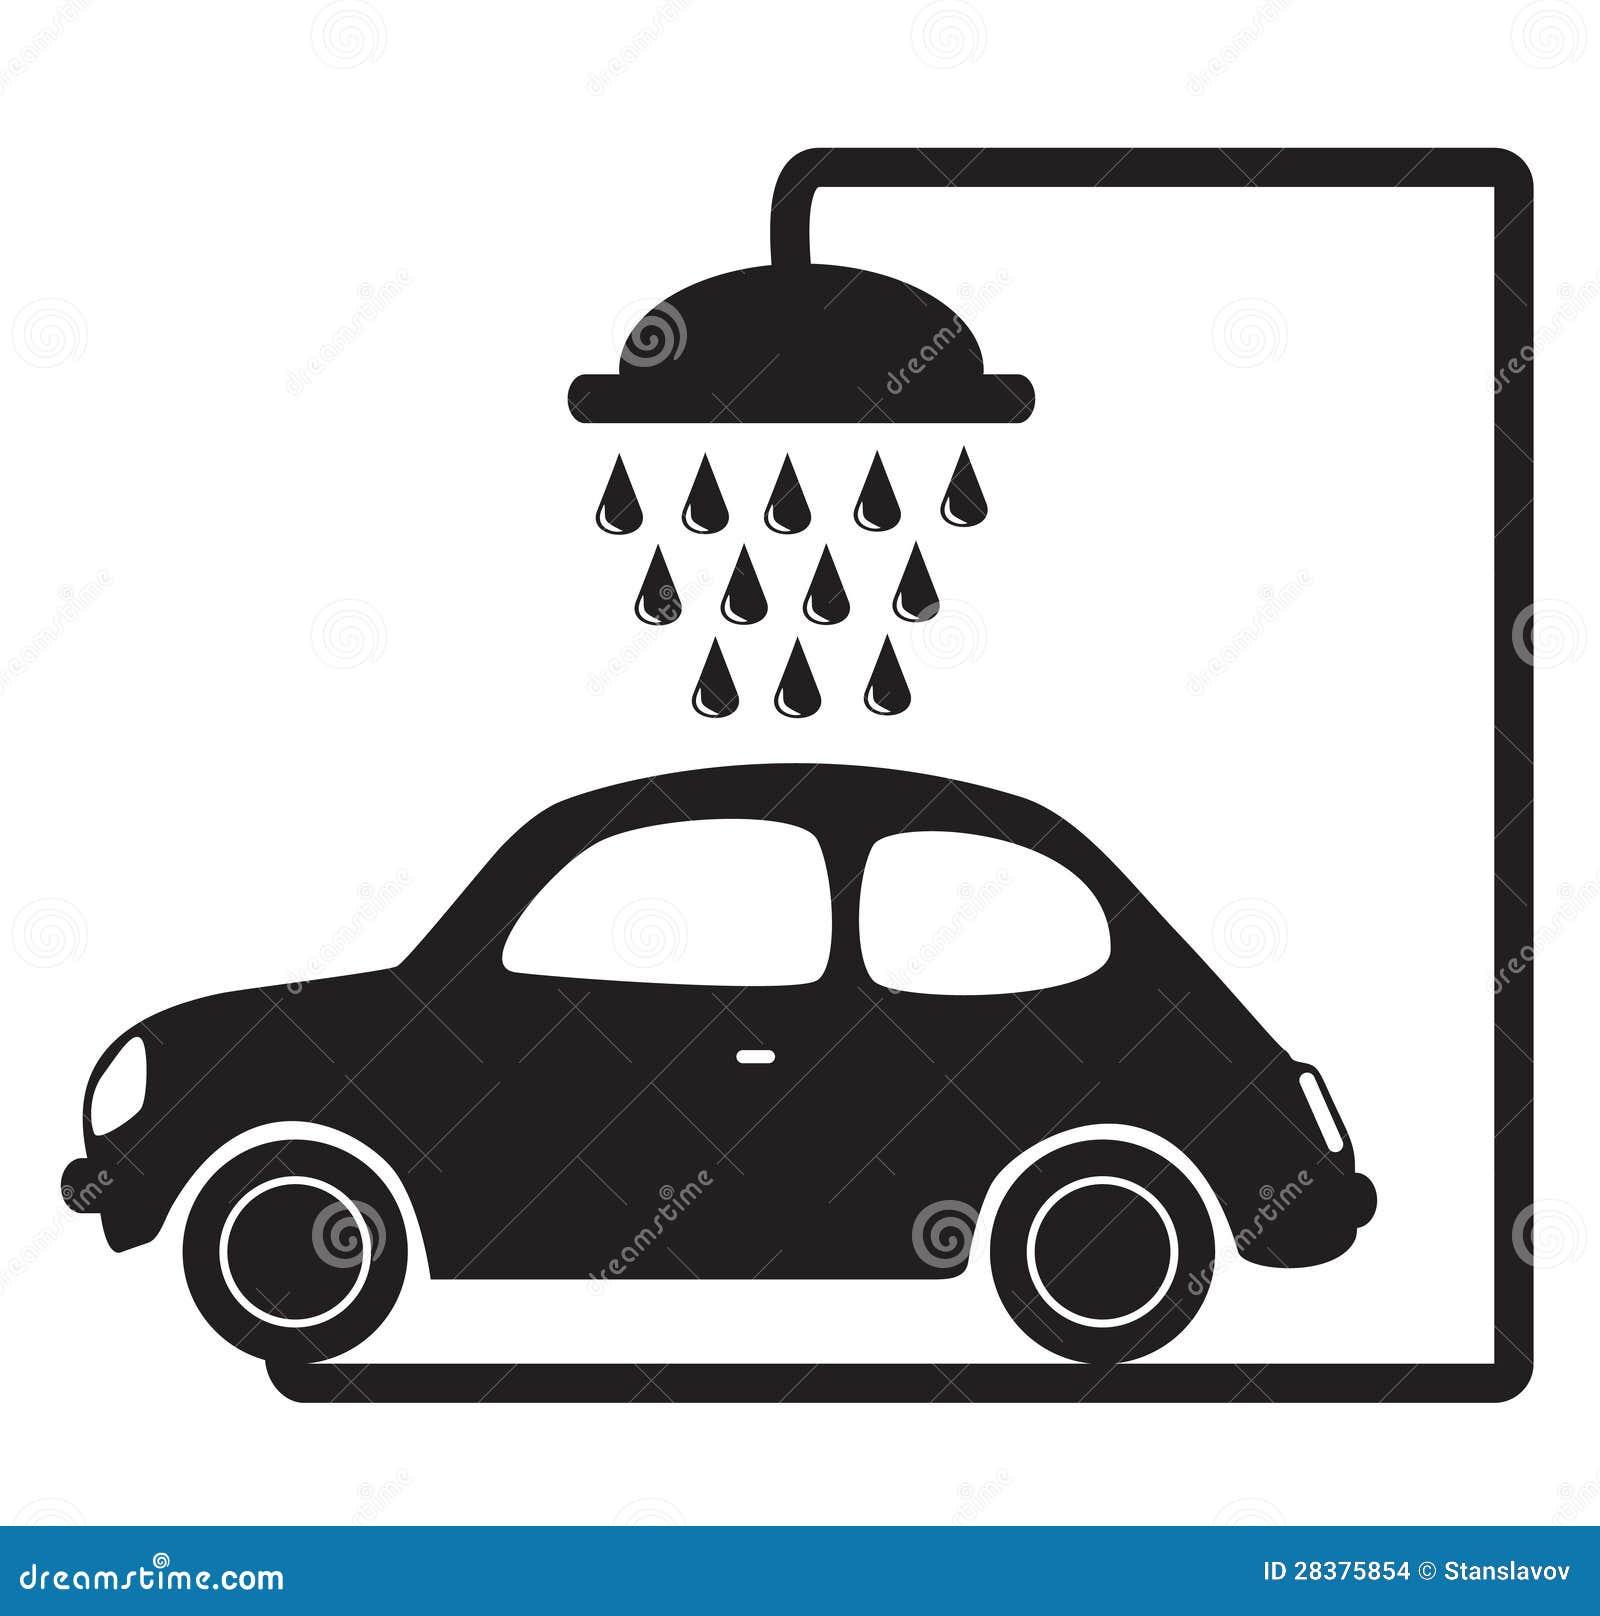 Management Plan Of Car Wash